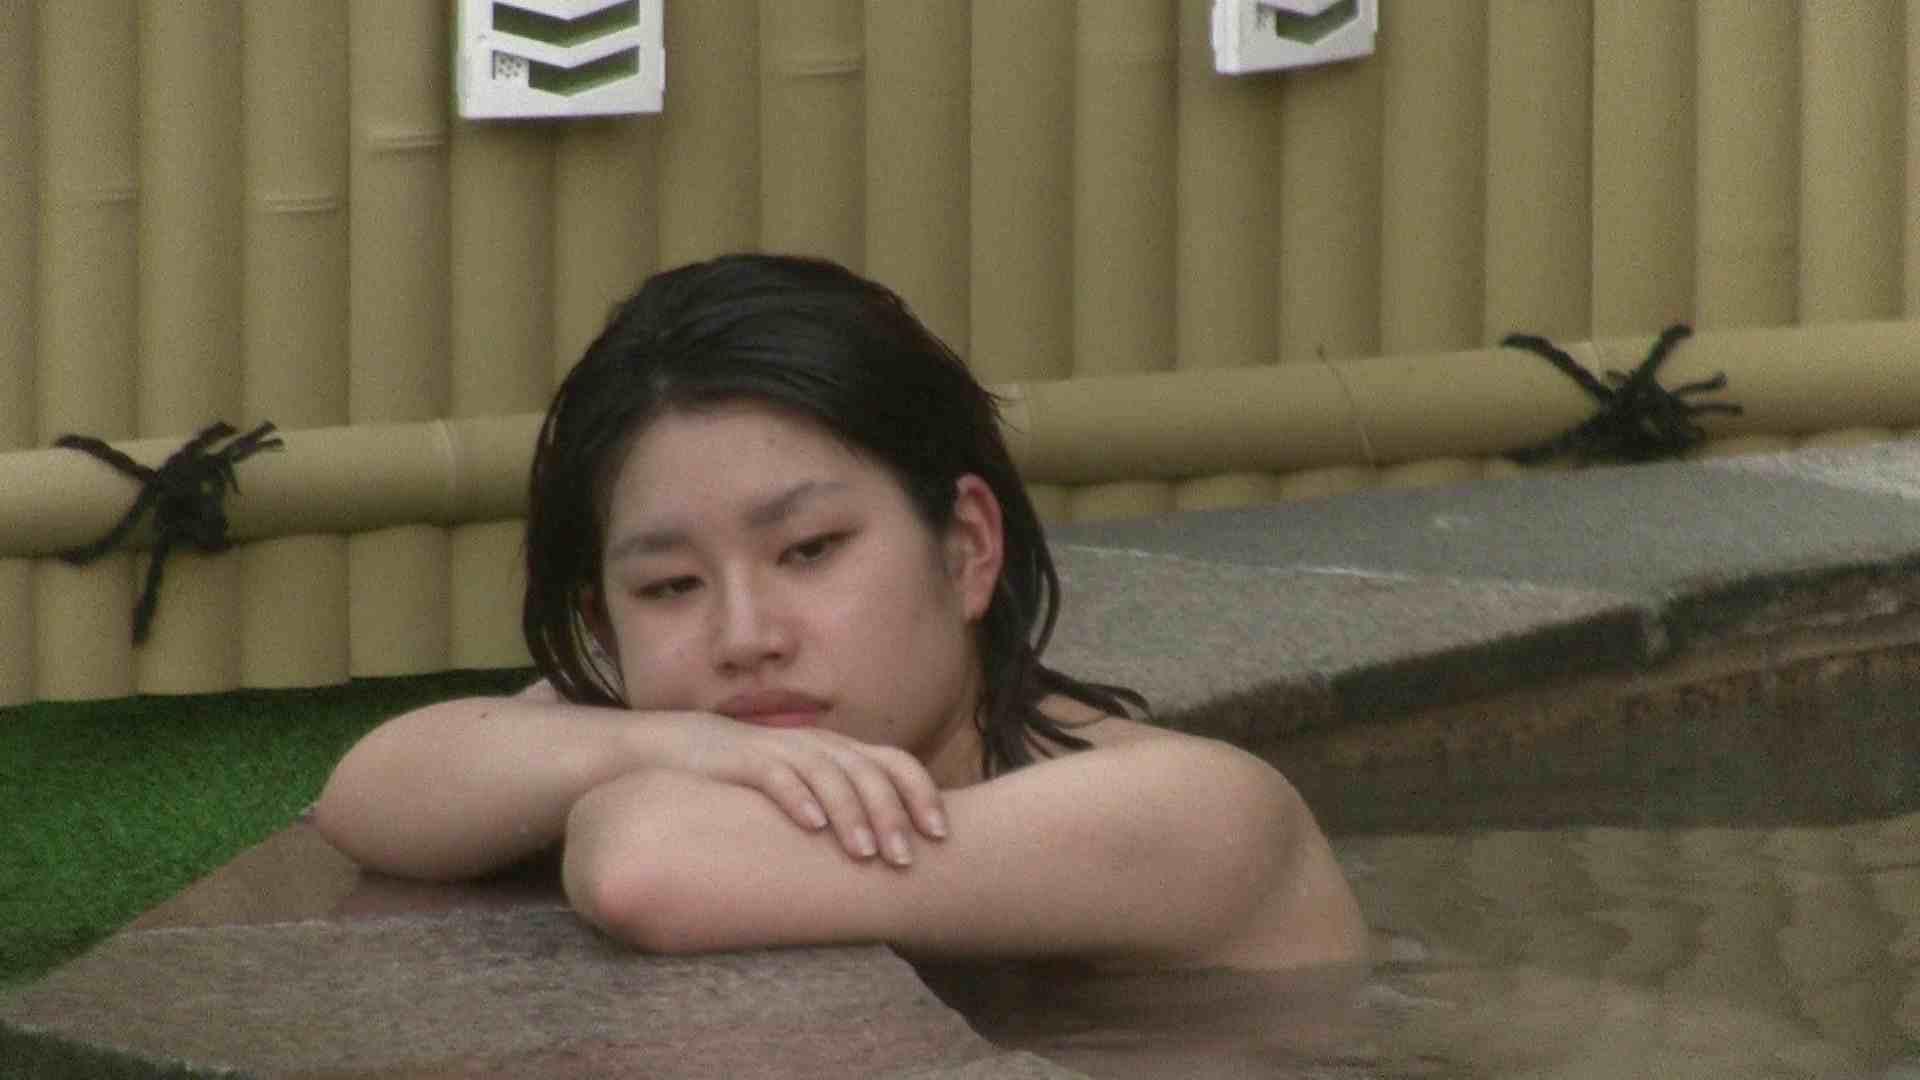 Aquaな露天風呂Vol.230 盗撮 | OLセックス  96画像 40